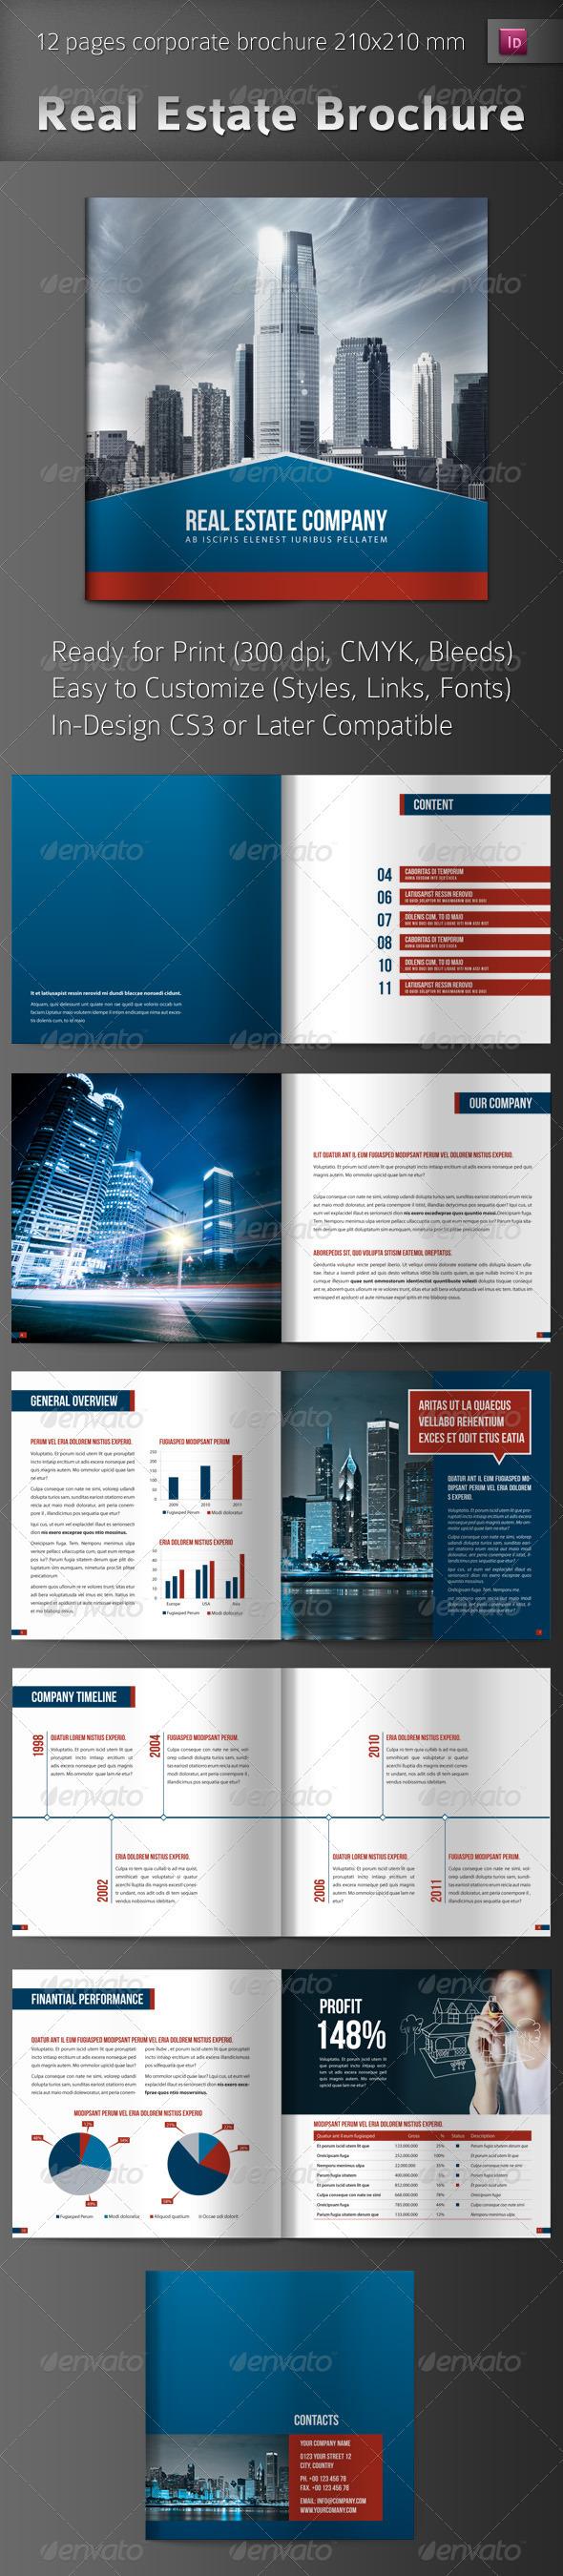 Graphic River Real Estate Brochure Print Templates -  Brochures  Corporate 721501